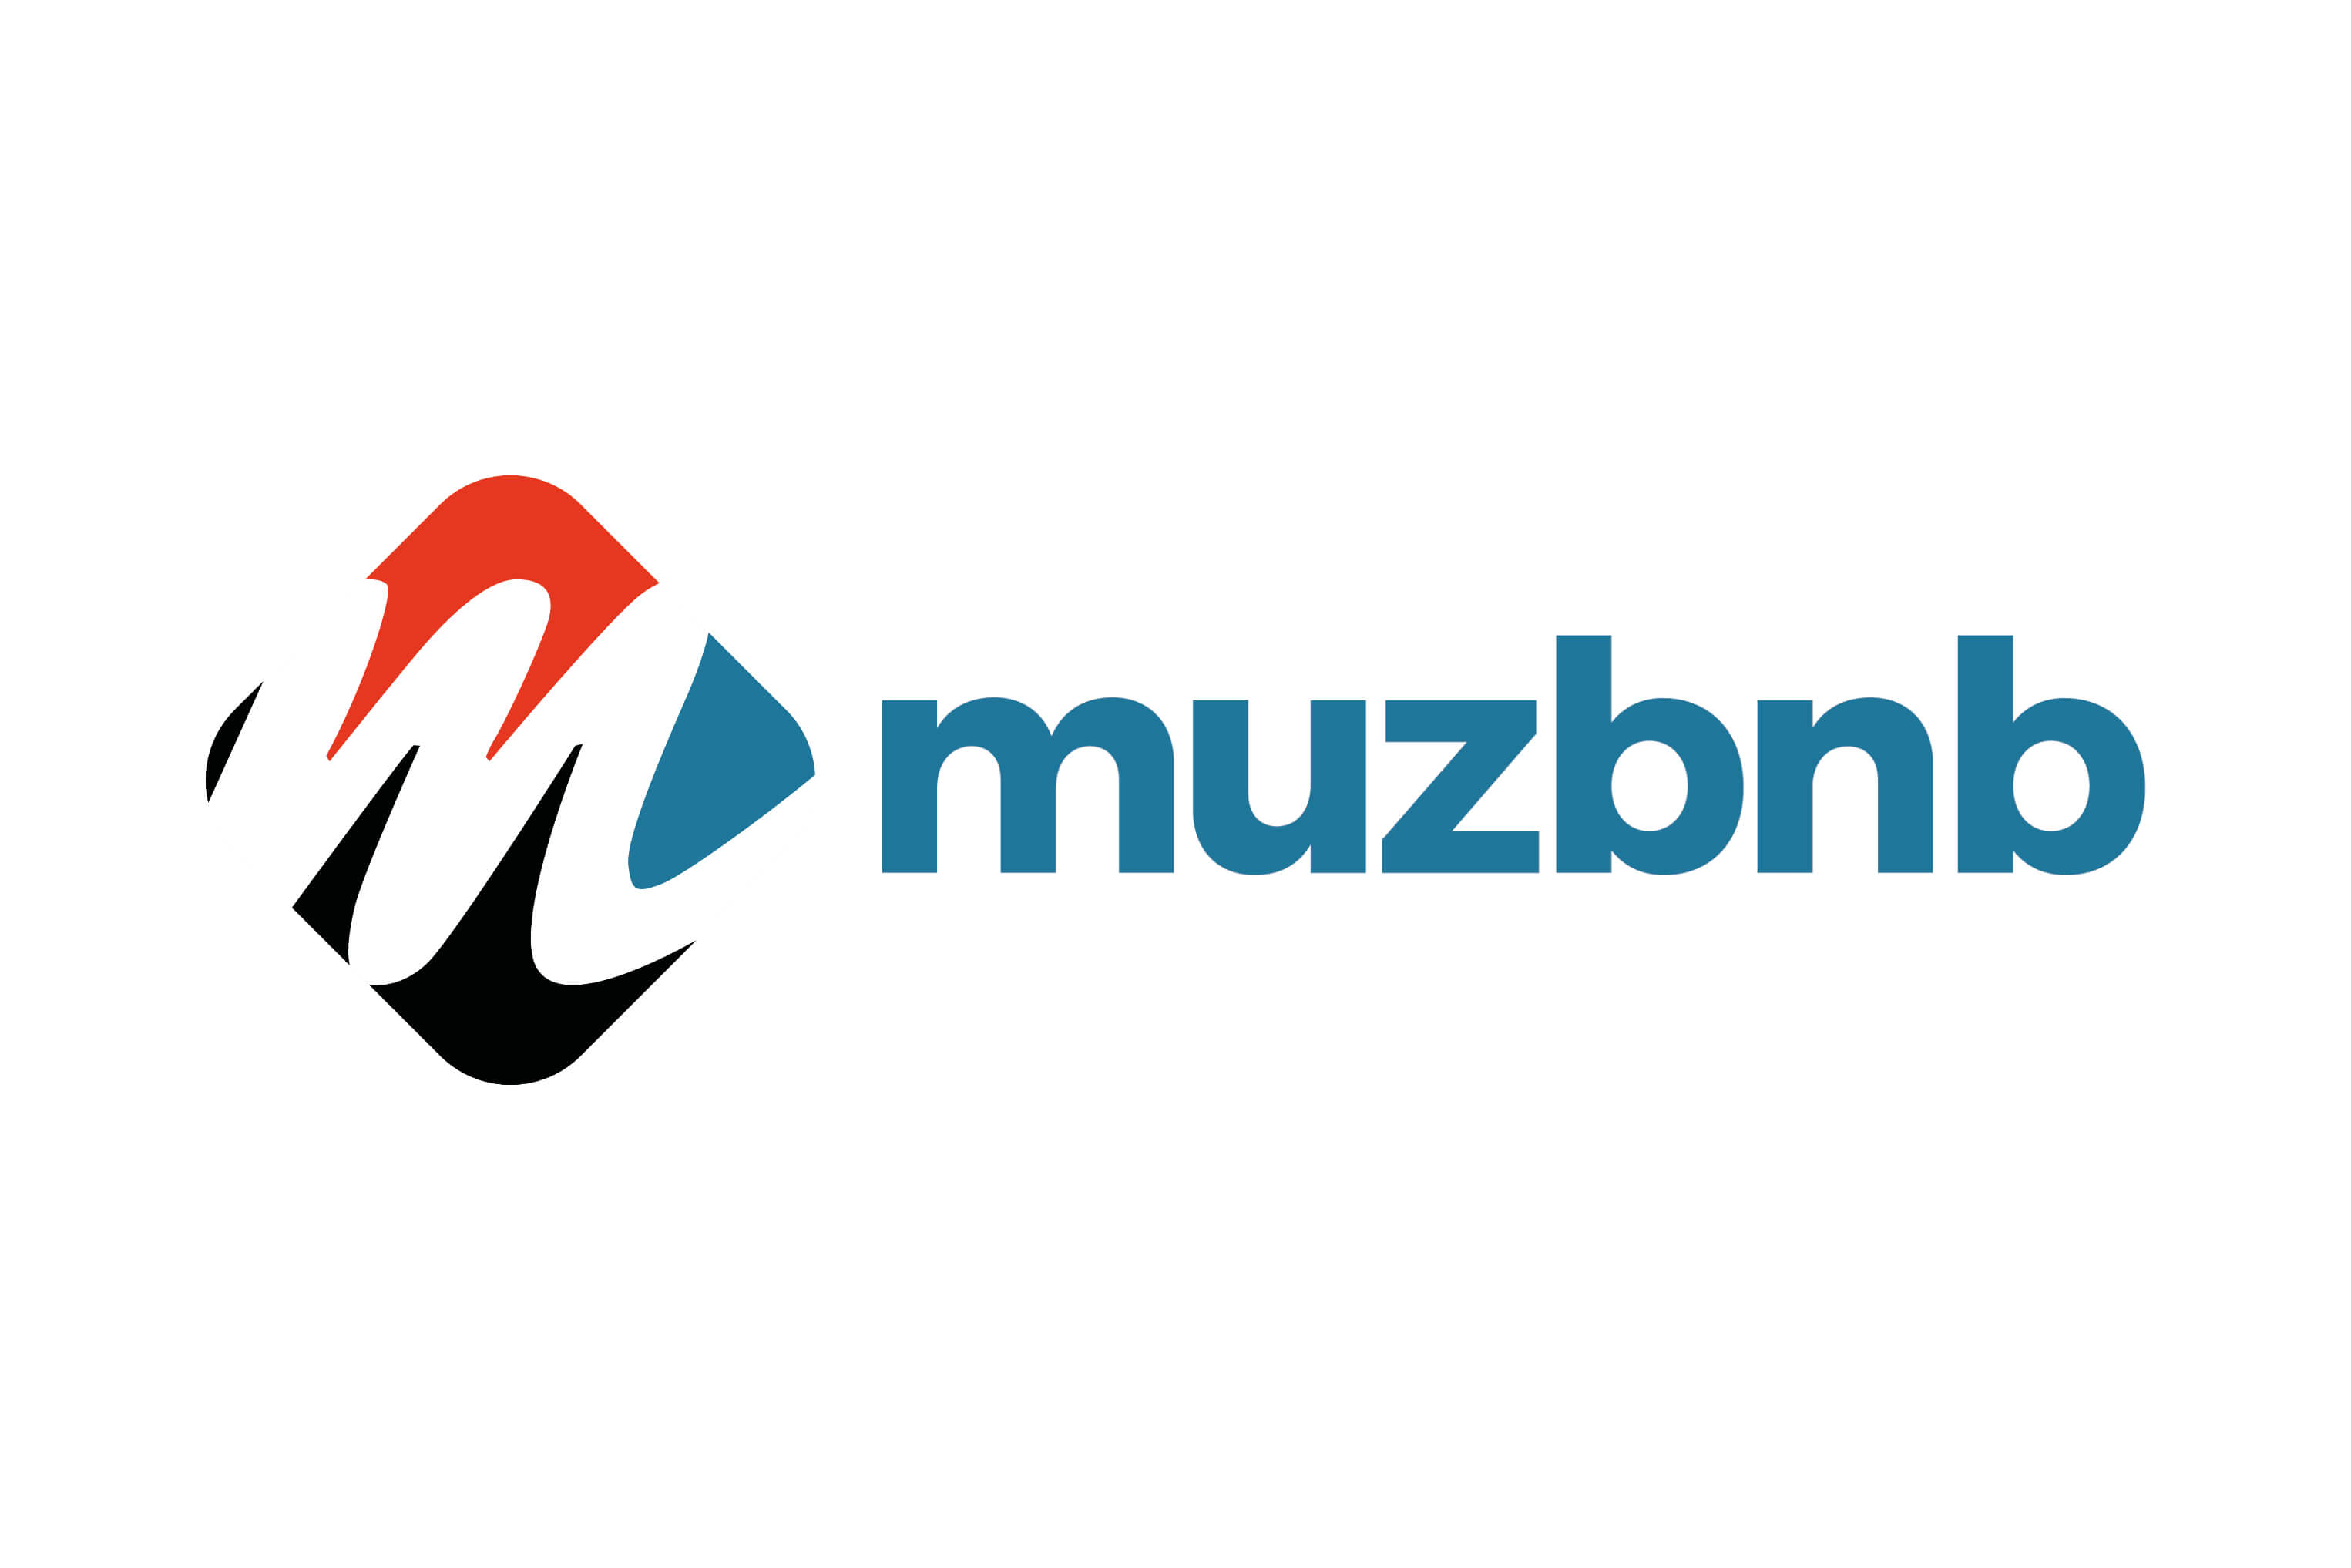 Muzbnb Logo